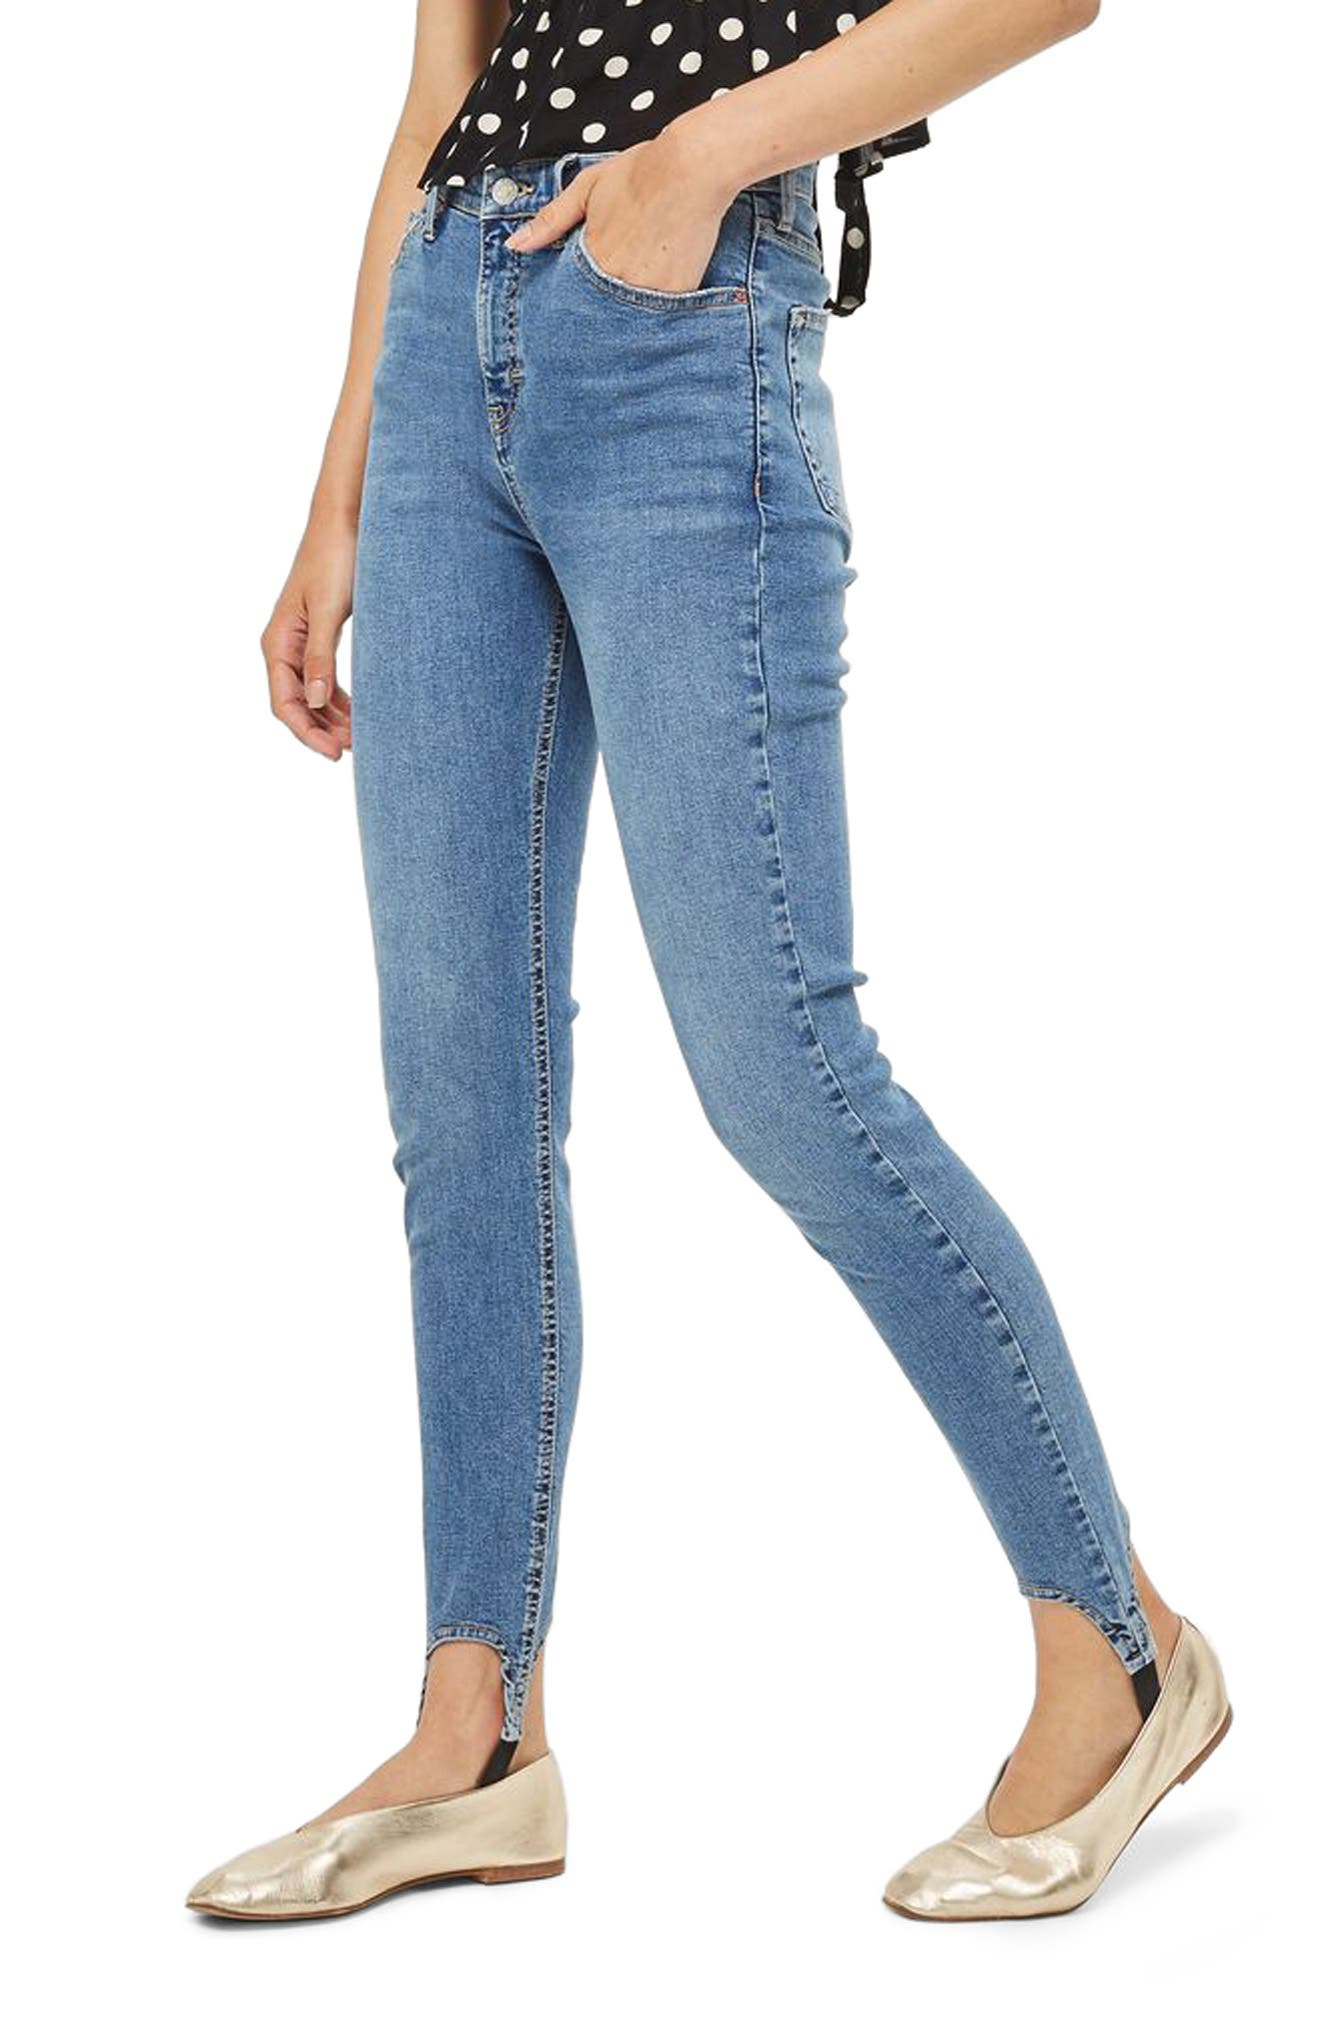 Topshop Jamie High Rise Skinny Stirrup Jeans